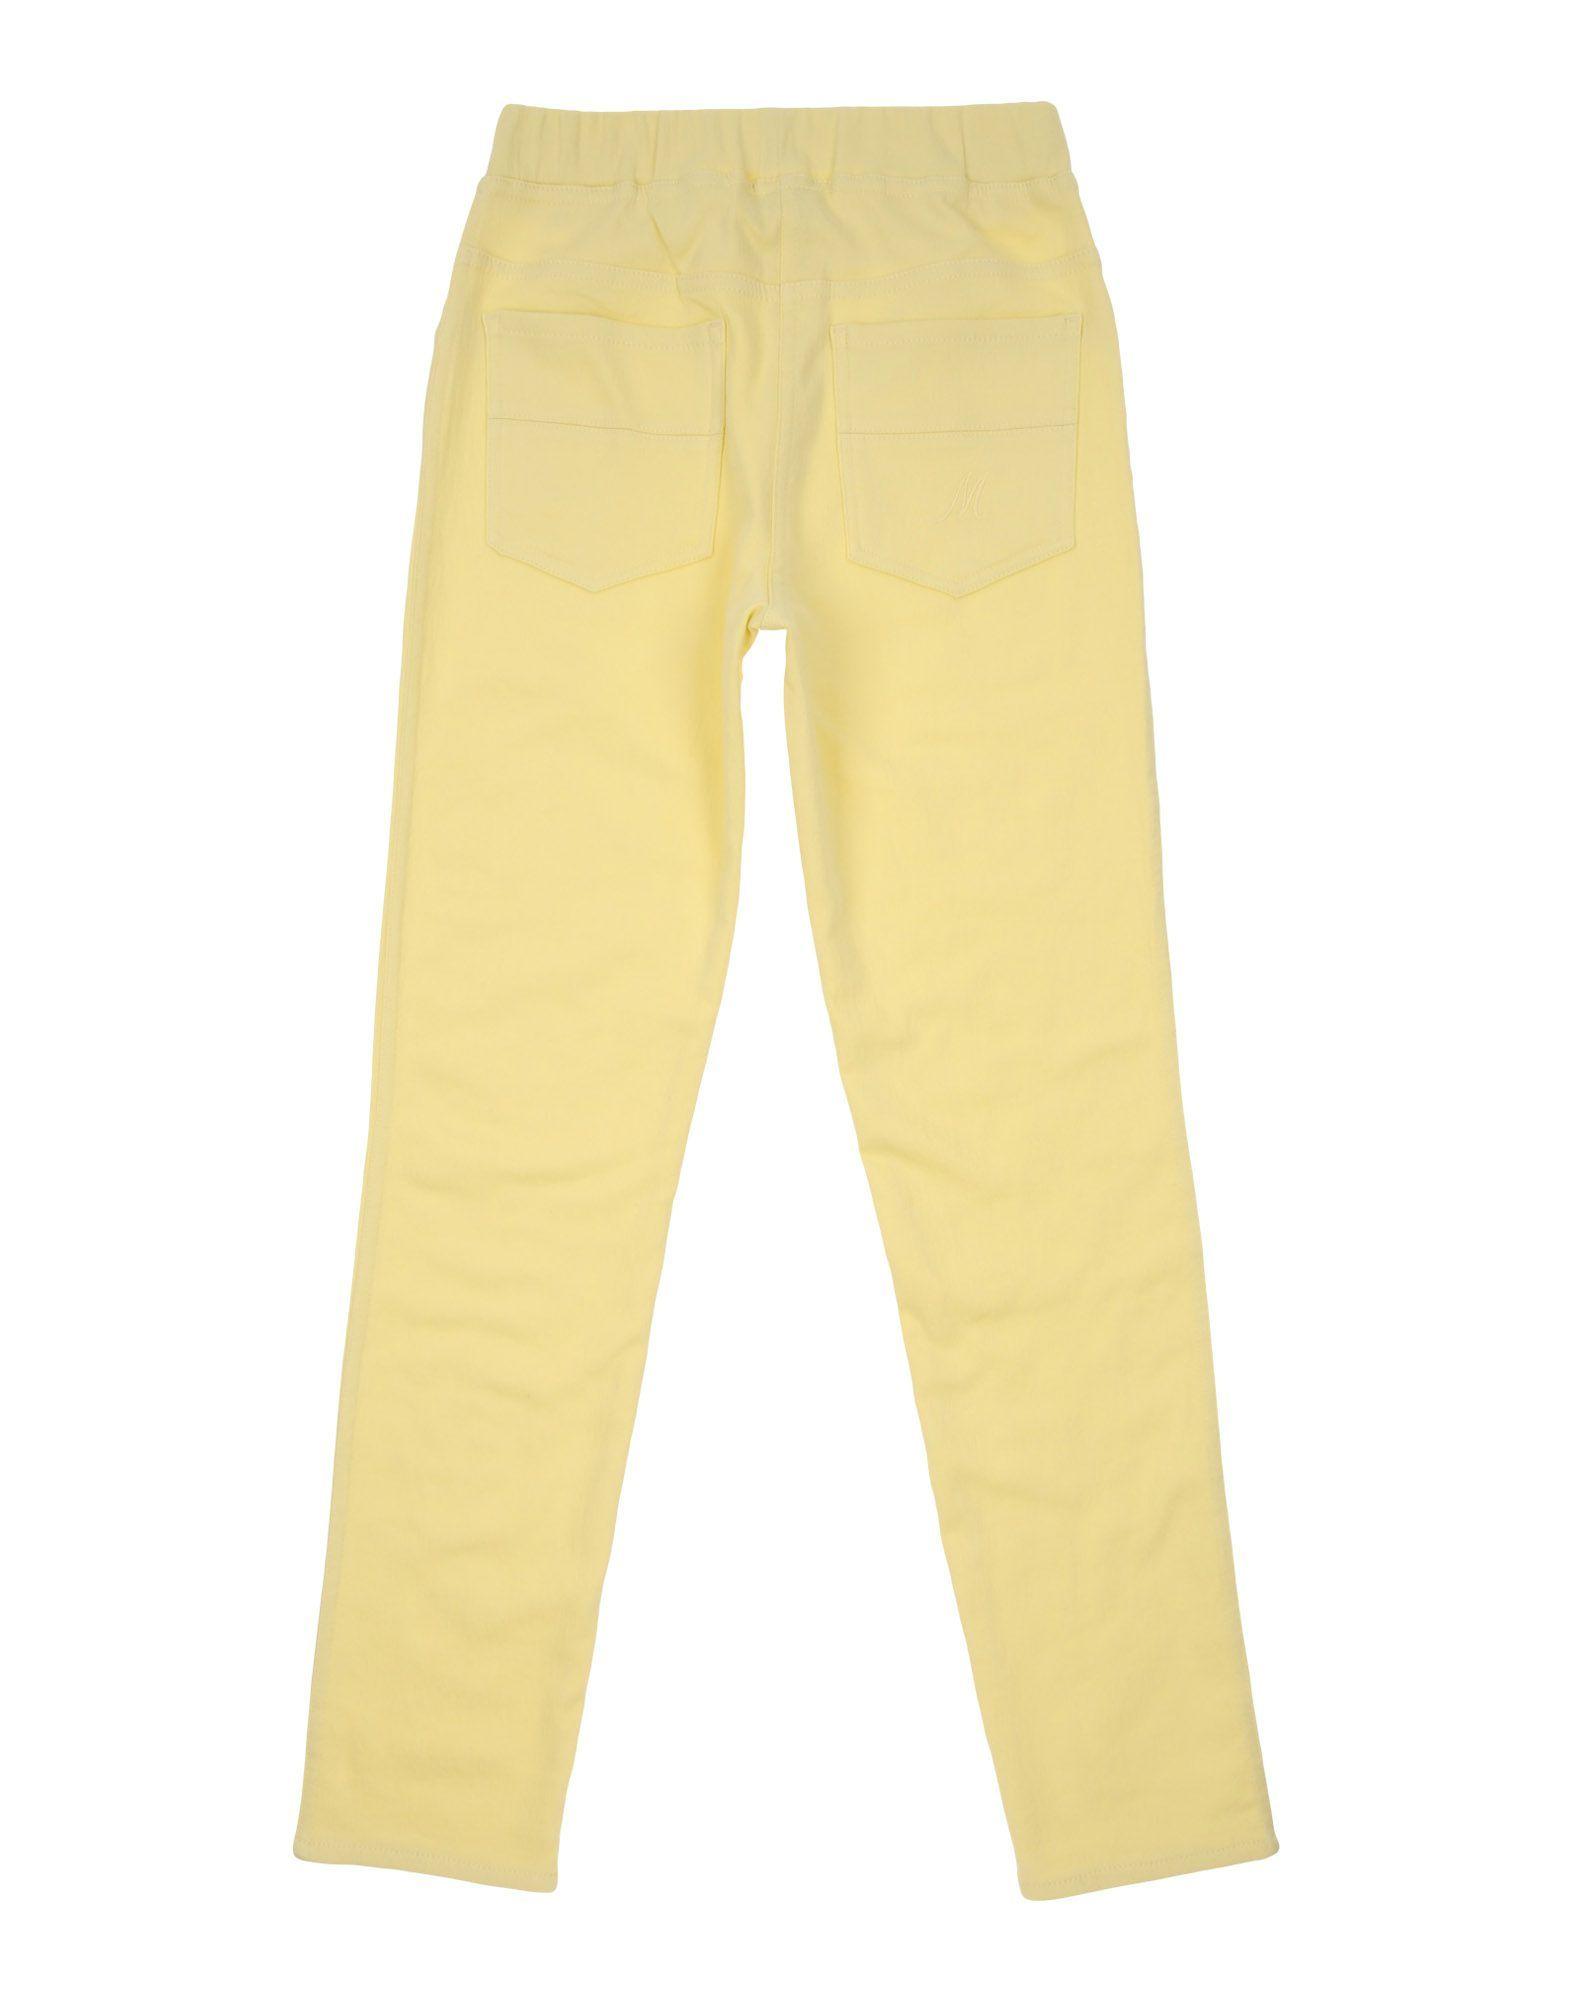 TROUSERS Monnalisa Yellow Girl Cotton